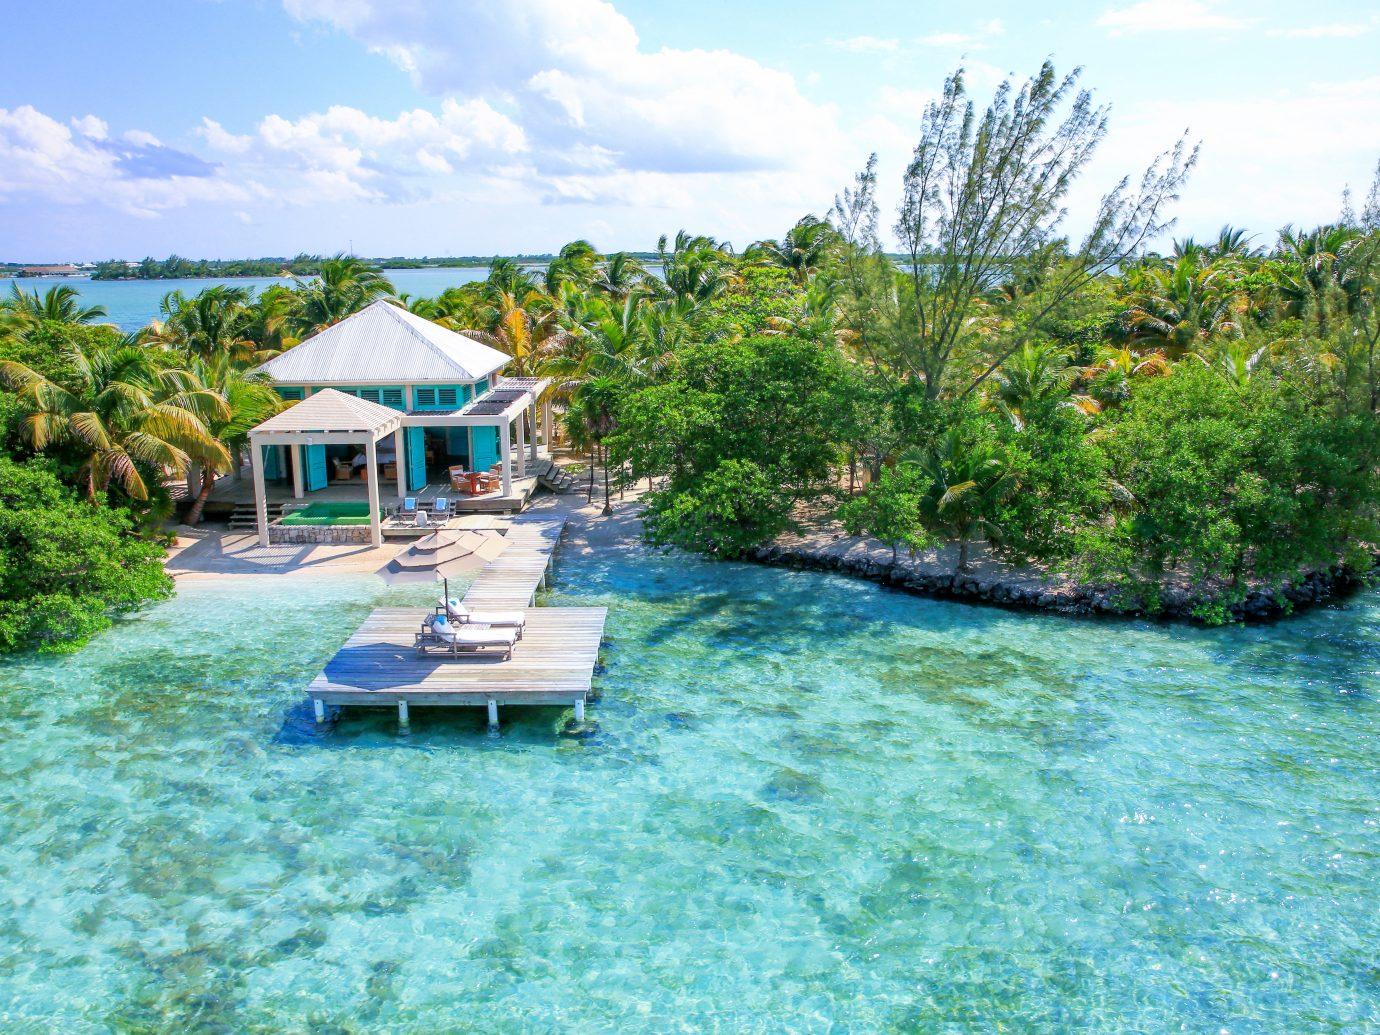 Island resort Cayo Espanto in Belize